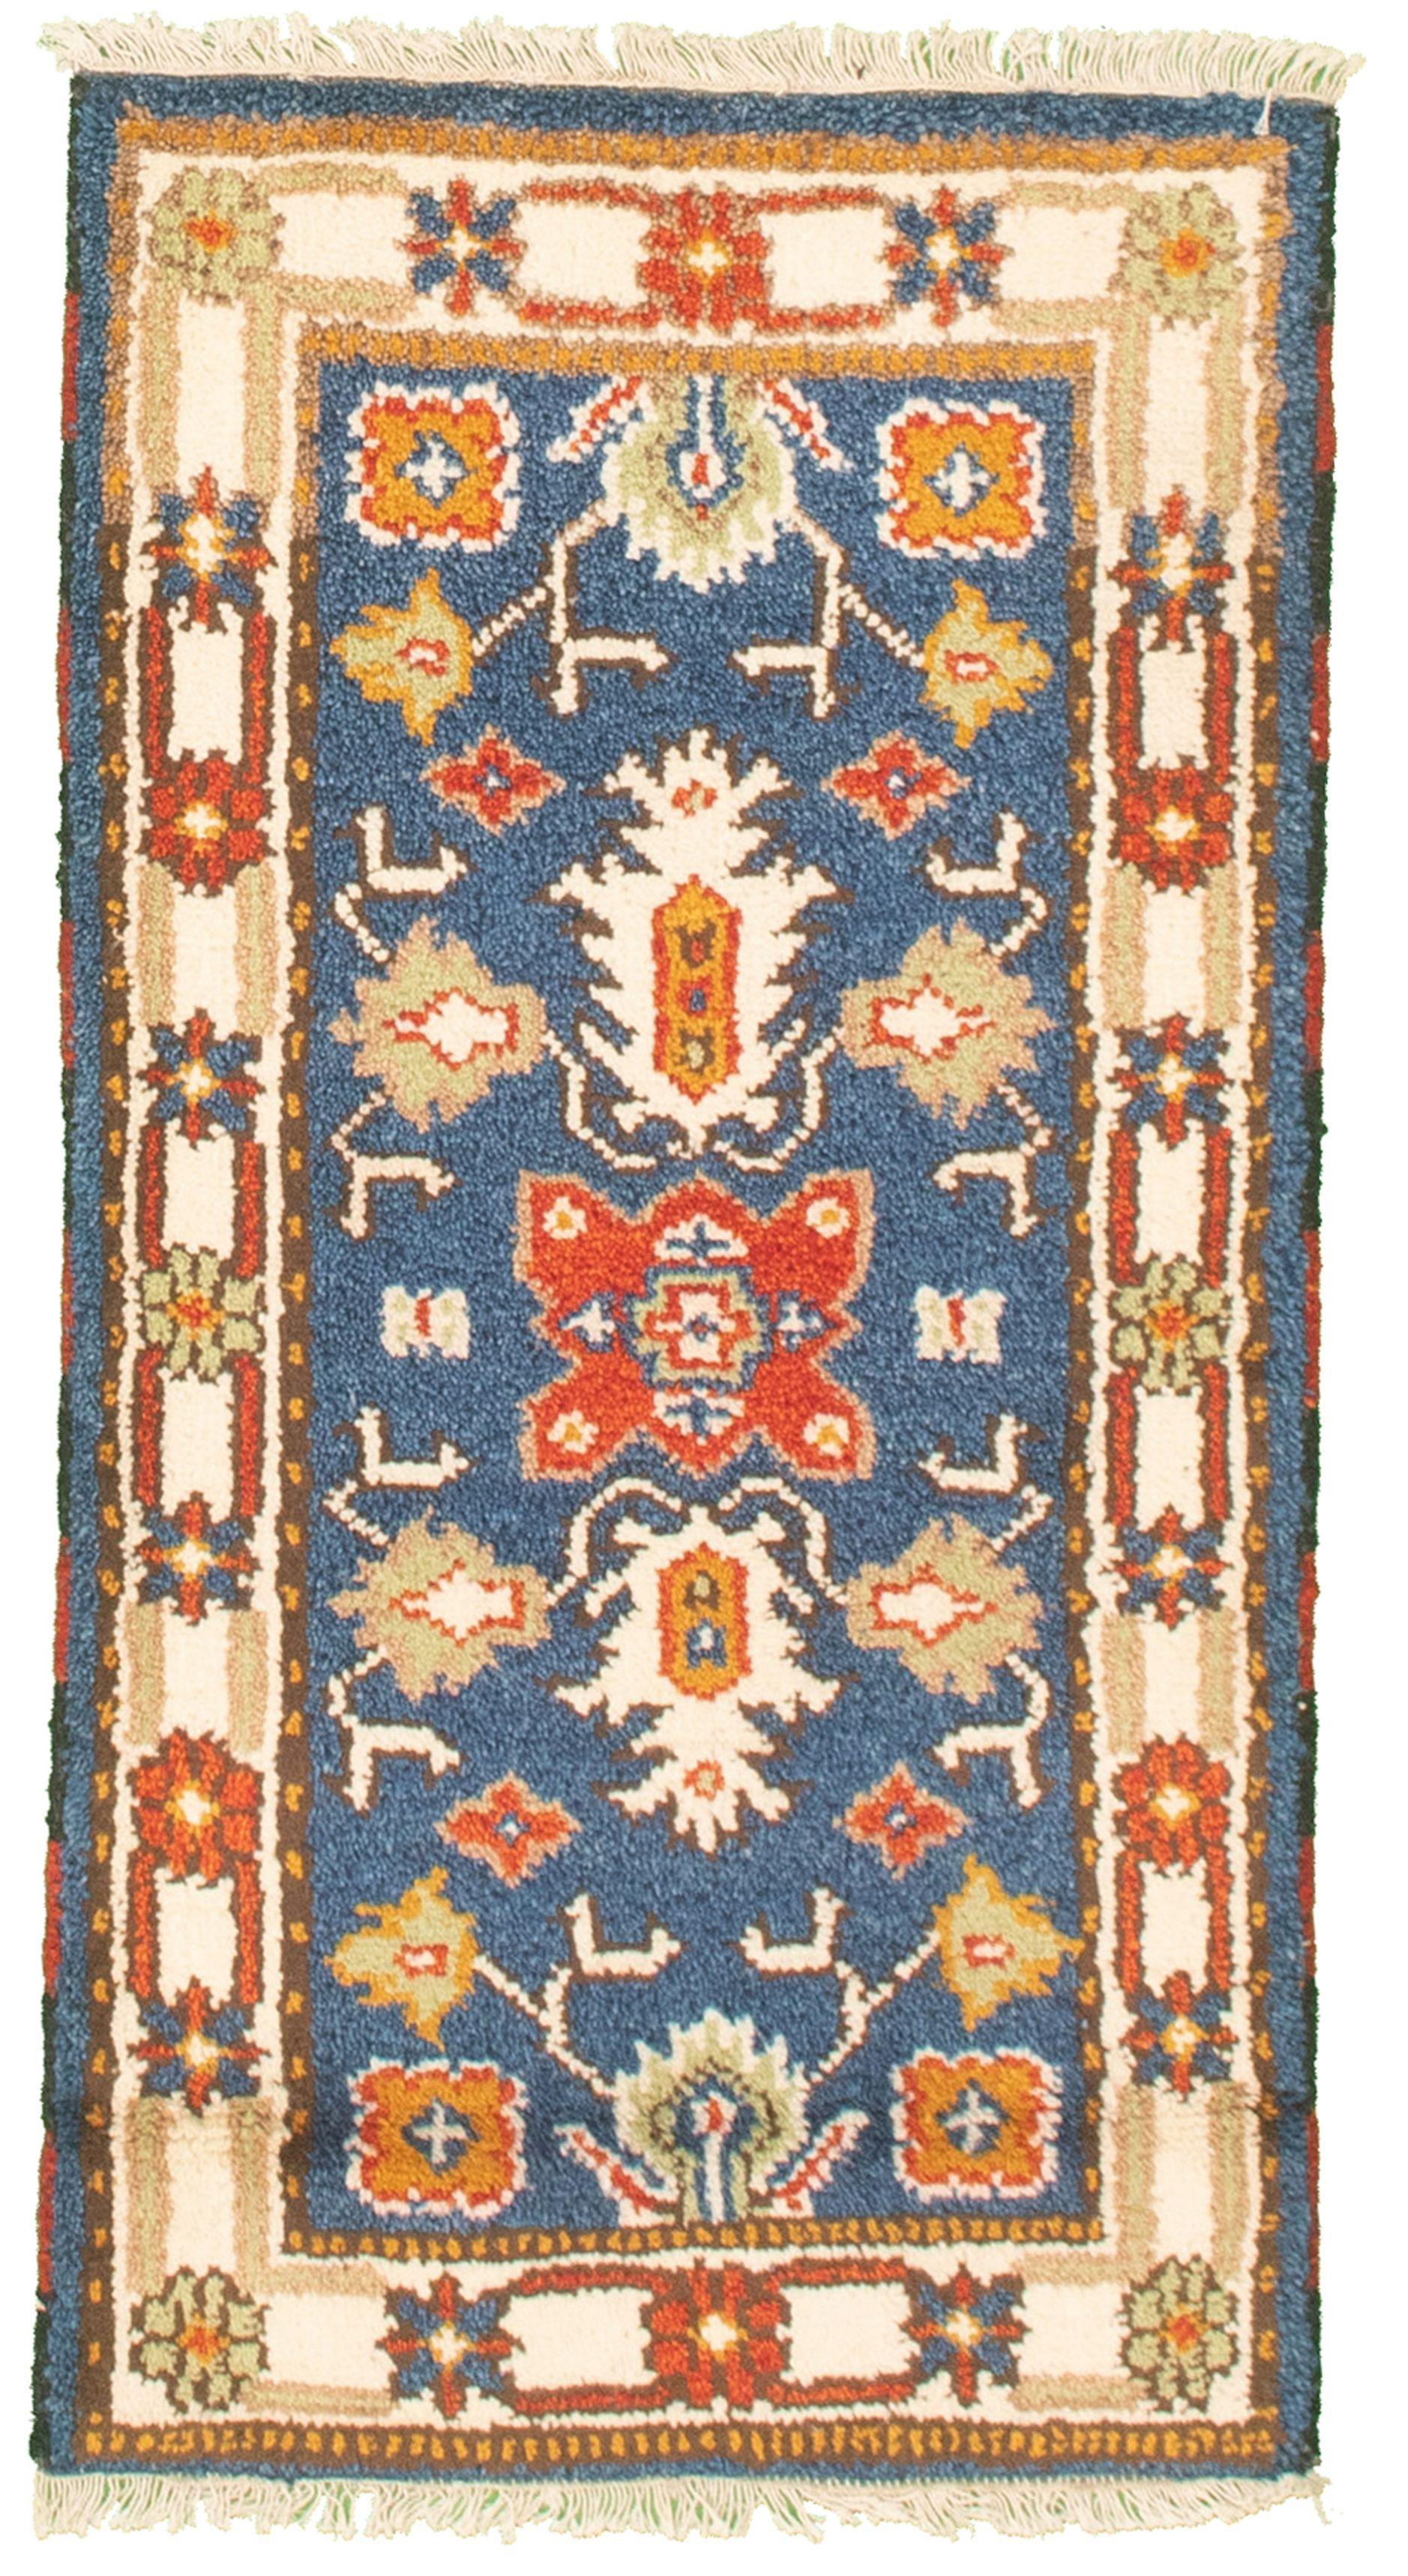 "Hand-knotted Royal Kazak Blue Cotton Rug 2'1"" x 4'0""  Size: 2'1"" x 4'0"""